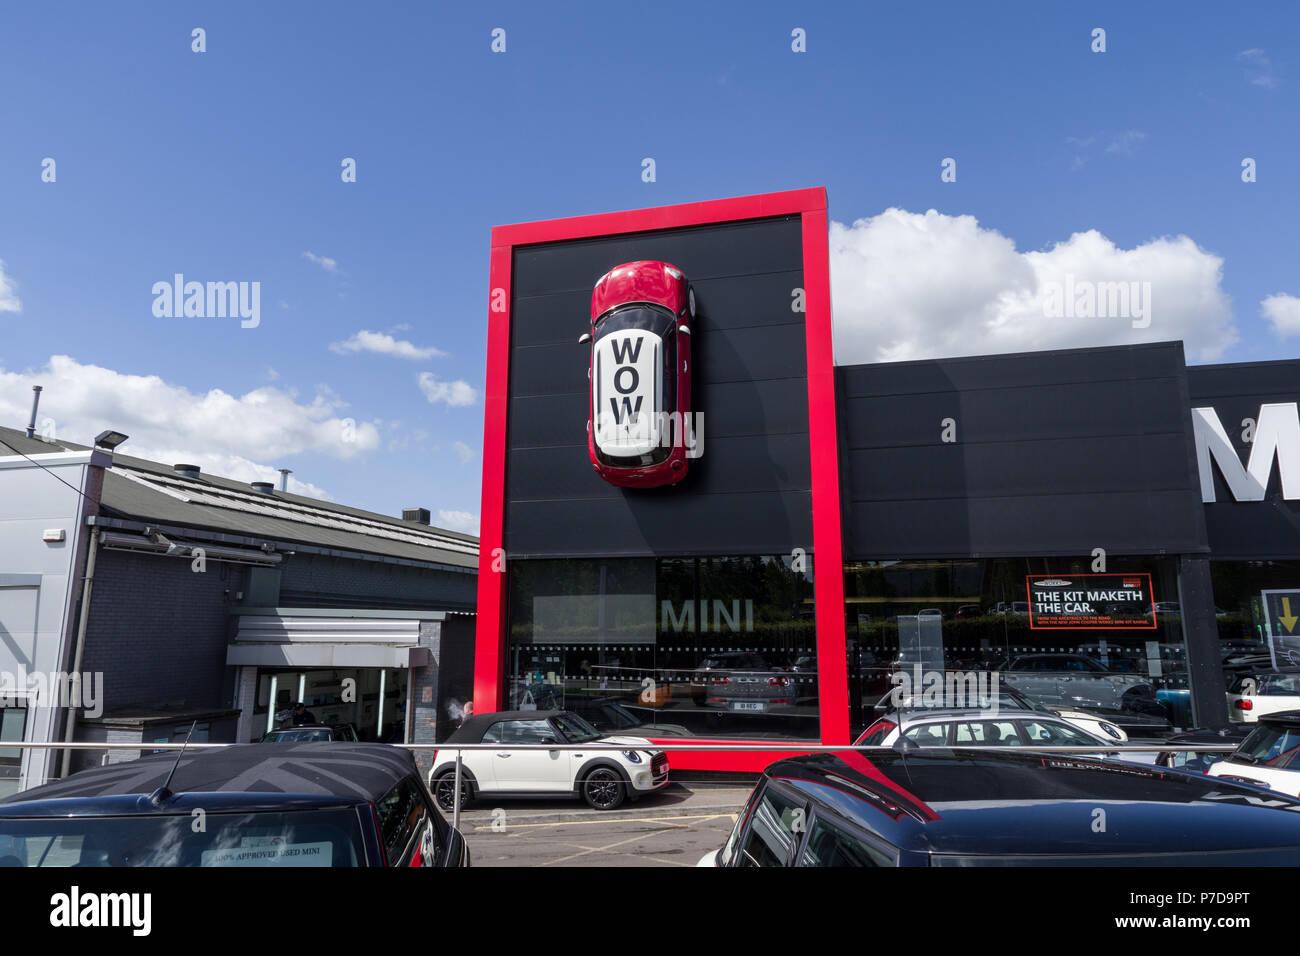 Car Dealers Stock Photos Amp Car Dealers Stock Images Alamy